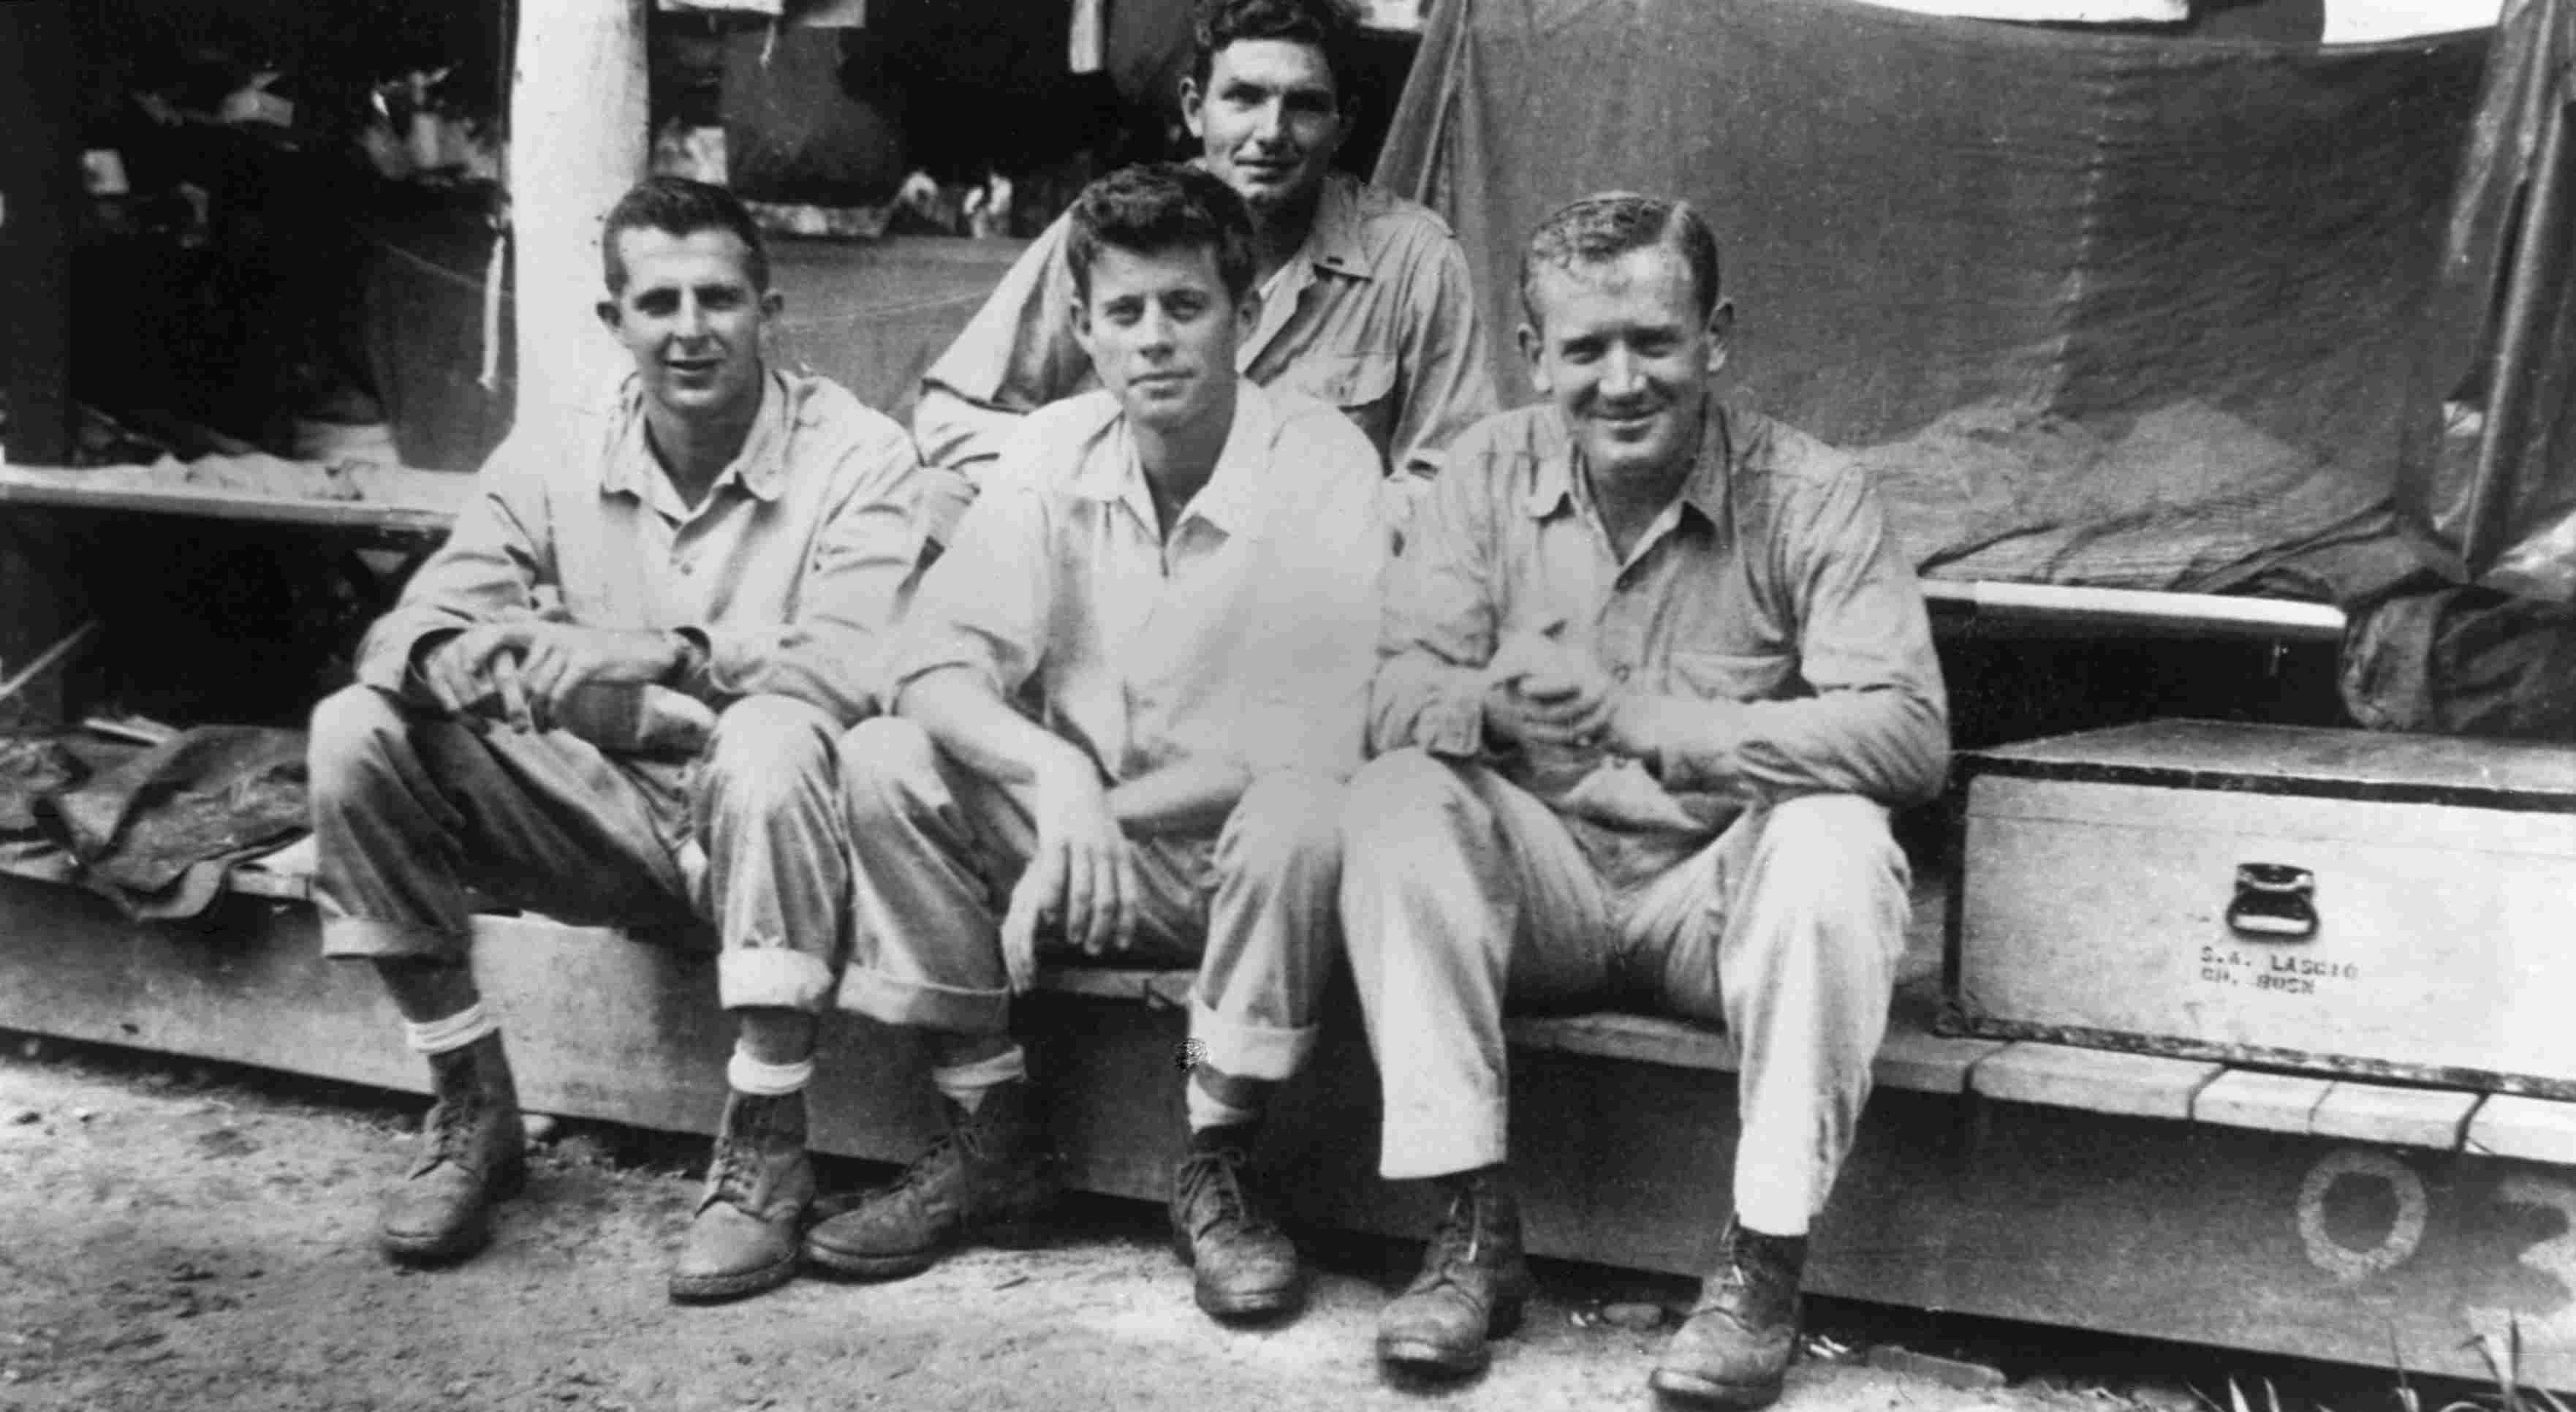 John F. Kennedy with fellow crew members